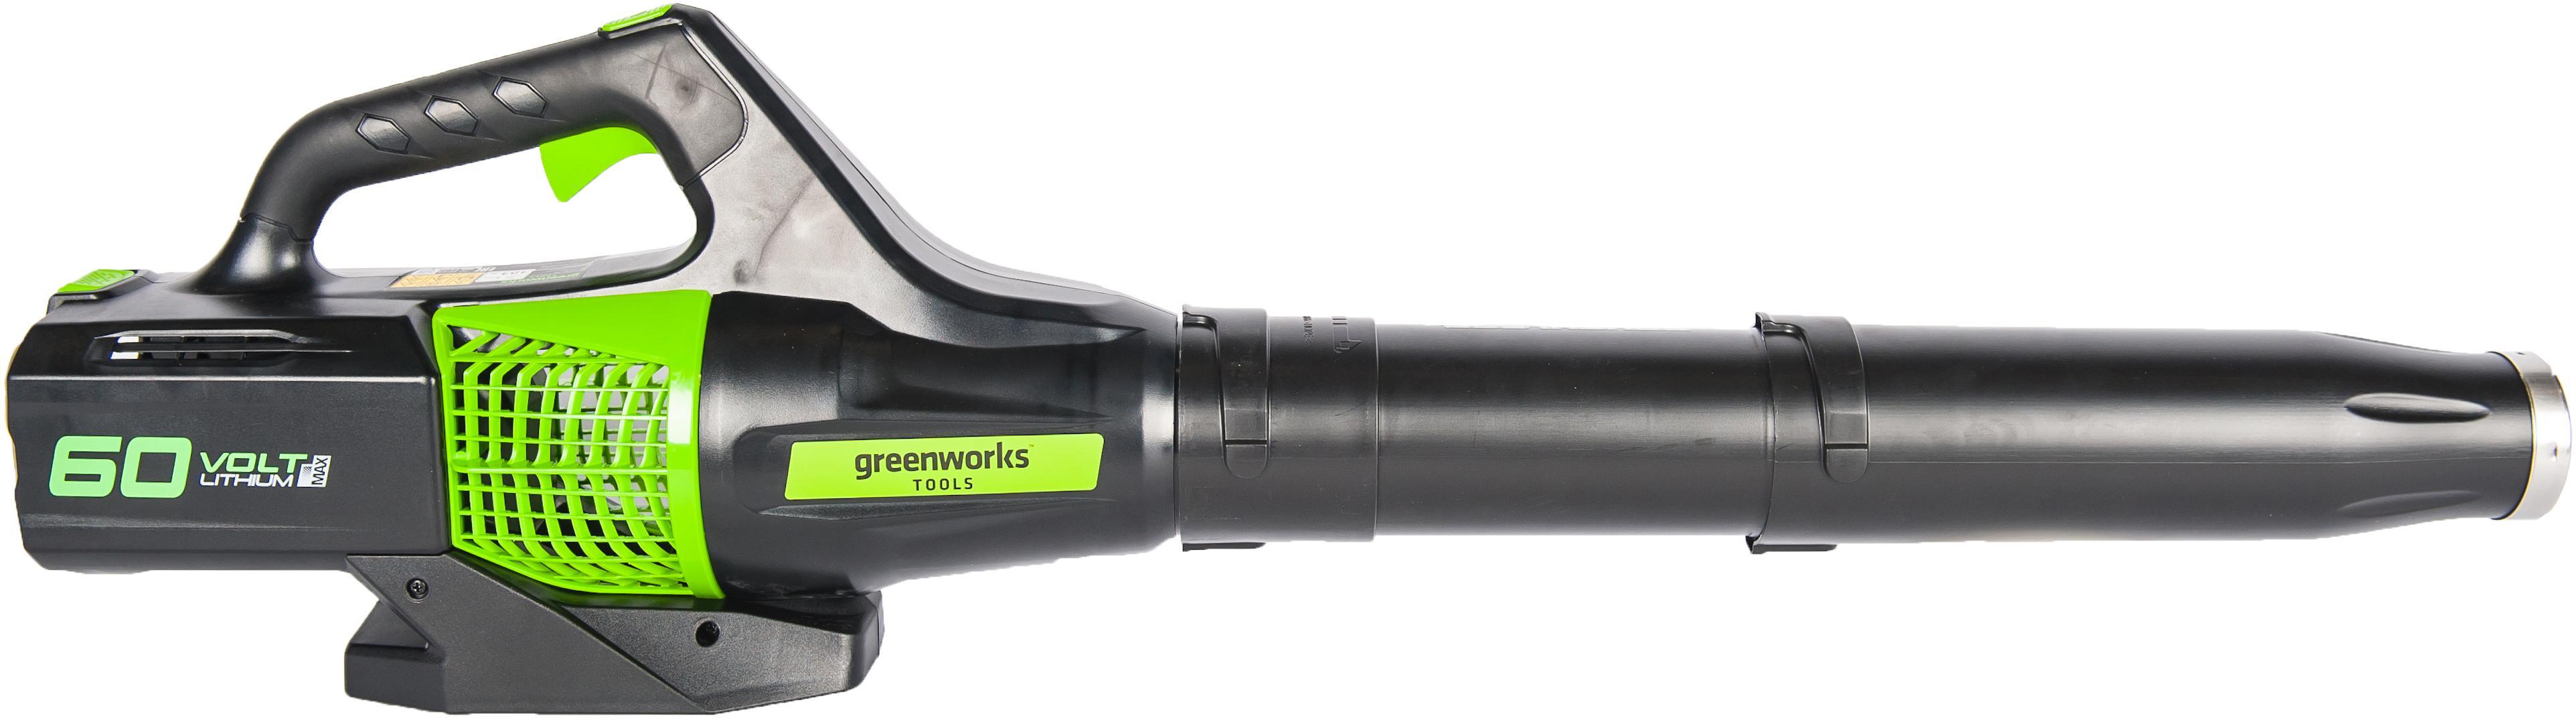 Воздуходувка Greenworks Gd60ab (2401307) БЕЗ АККУМ и ЗУ